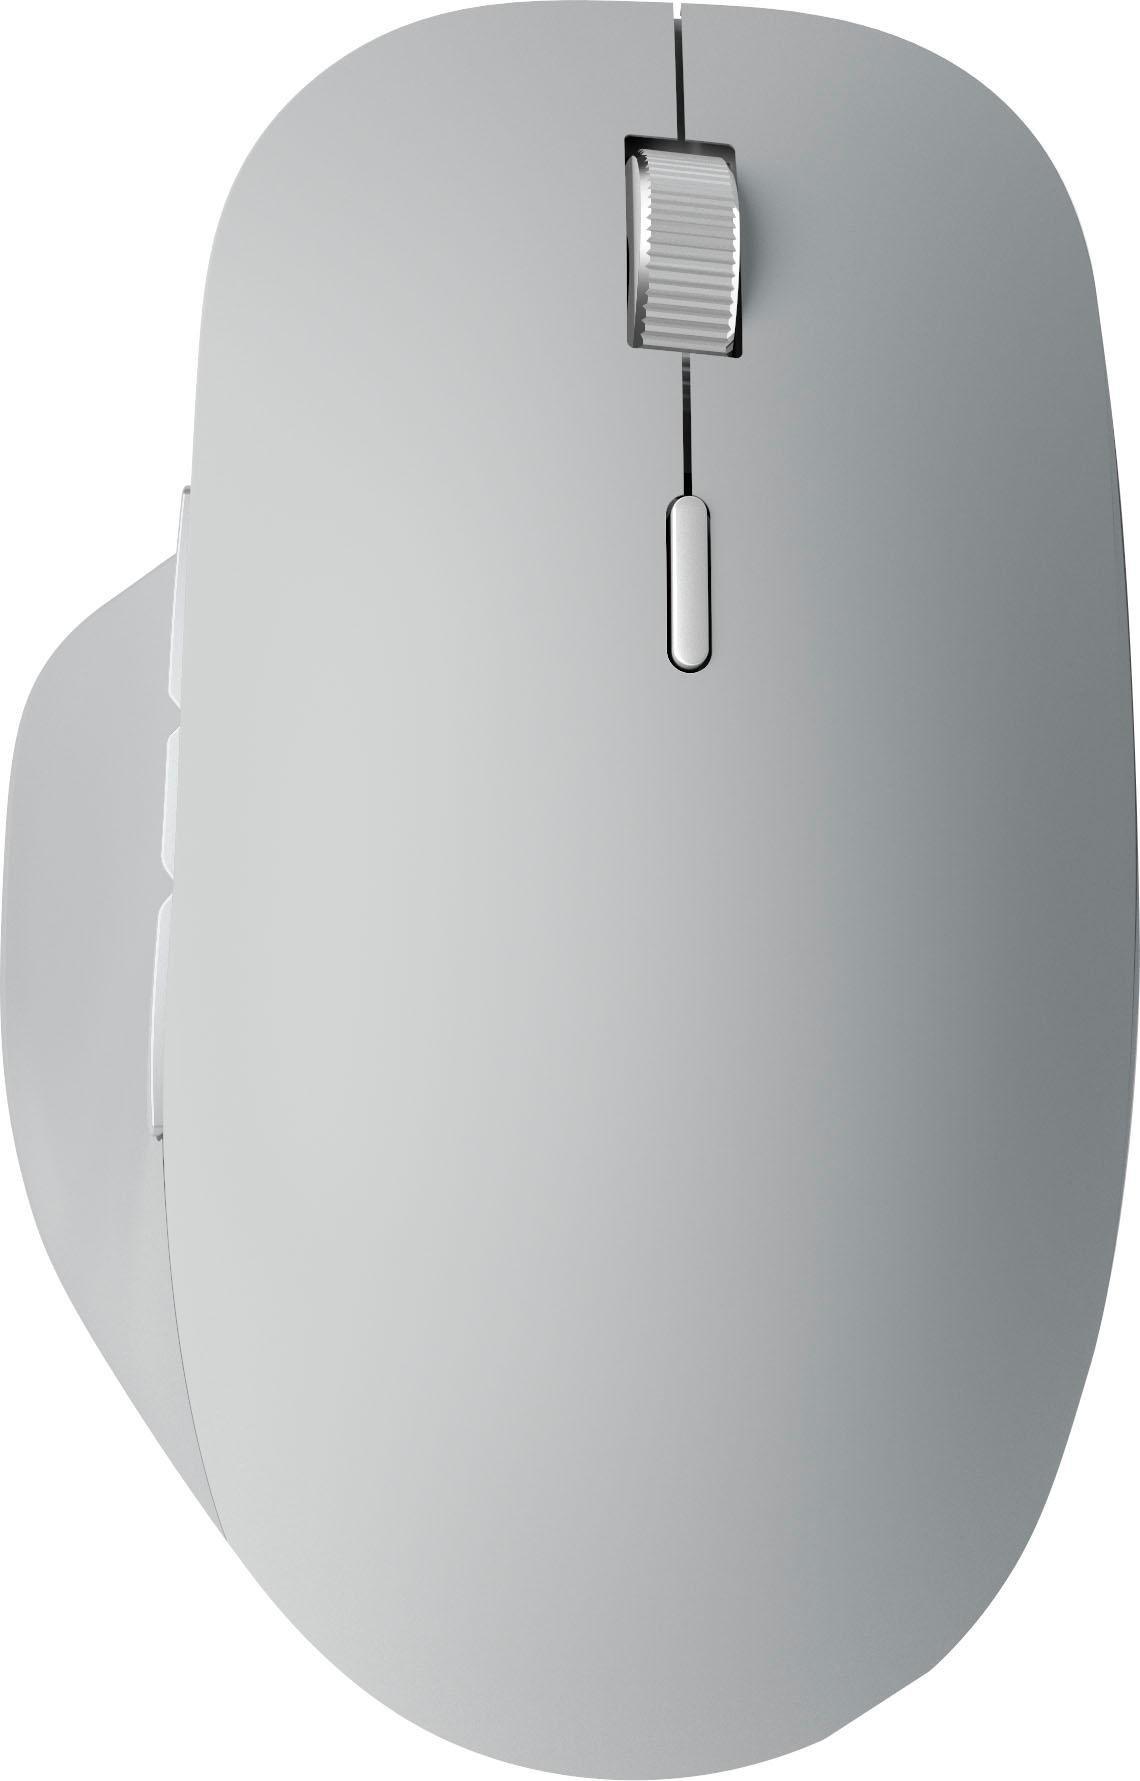 Microsoft »Surface Precision« muis (bedraad) - verschillende betaalmethodes